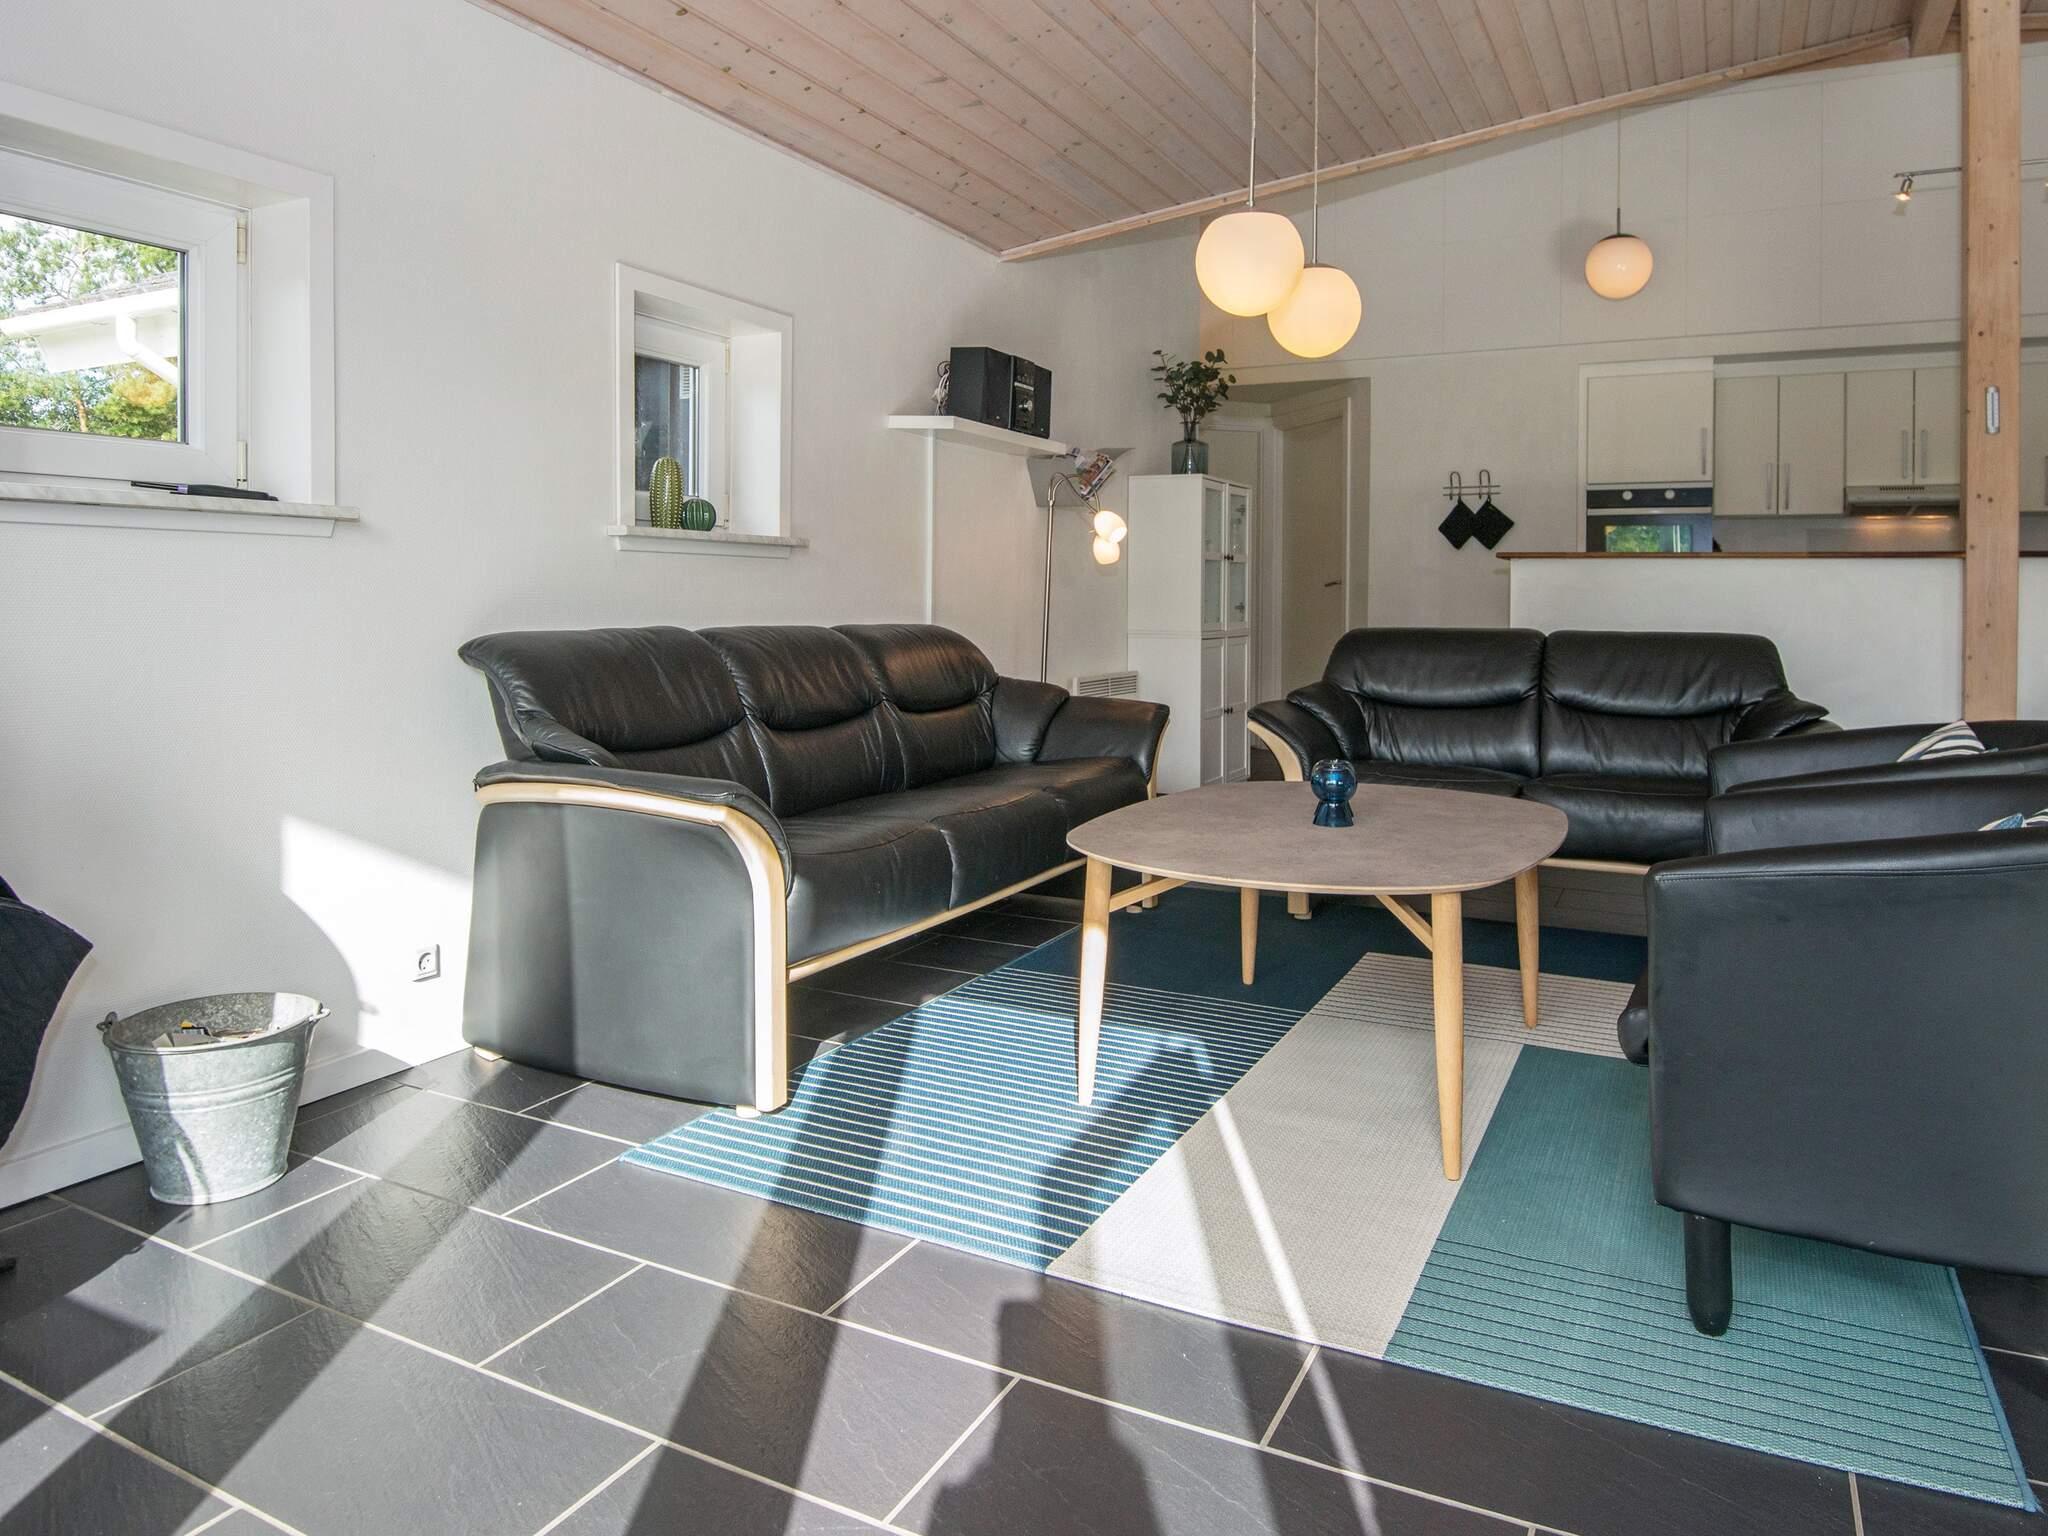 Ferienhaus Skaven Strand (336578), Tarm, , Westjütland, Dänemark, Bild 5